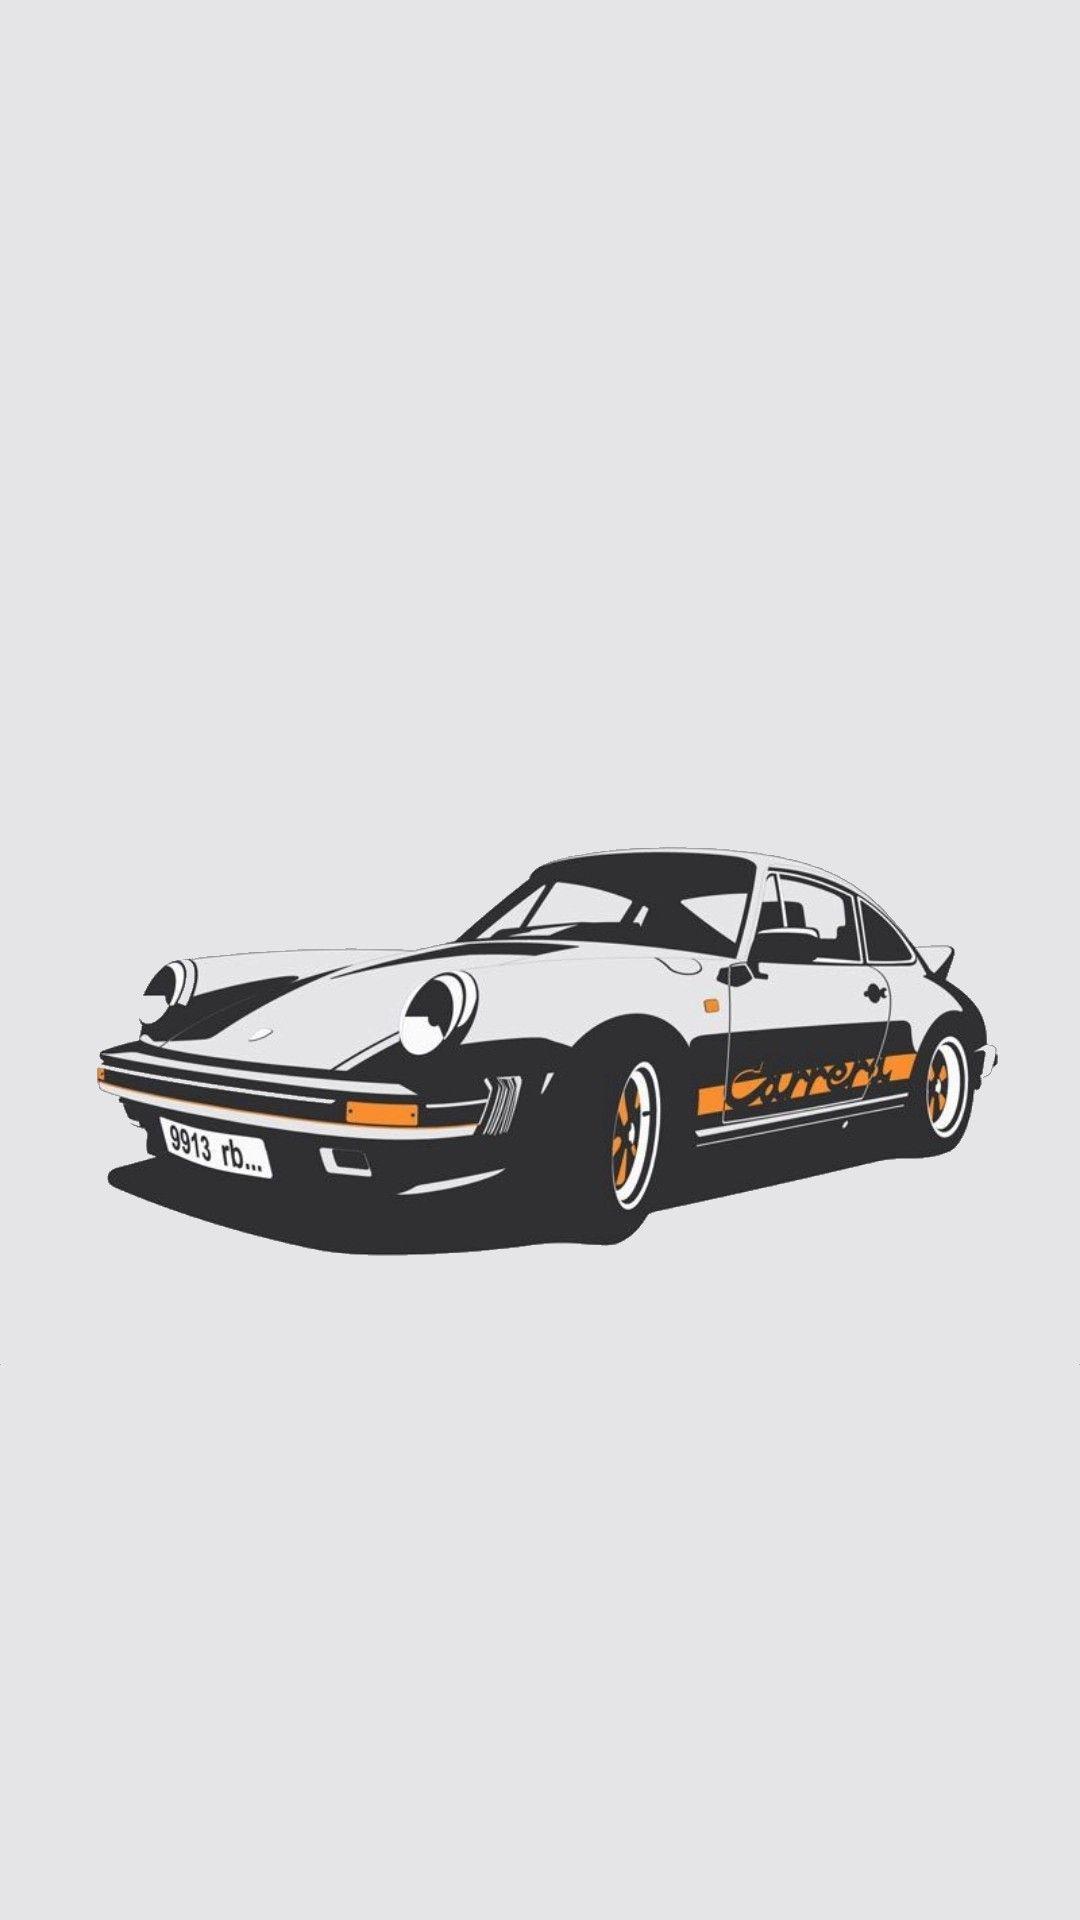 Pin By Jose Mario Carranco Villagomez On Cars Car Artwork Car Wallpapers Car Illustration